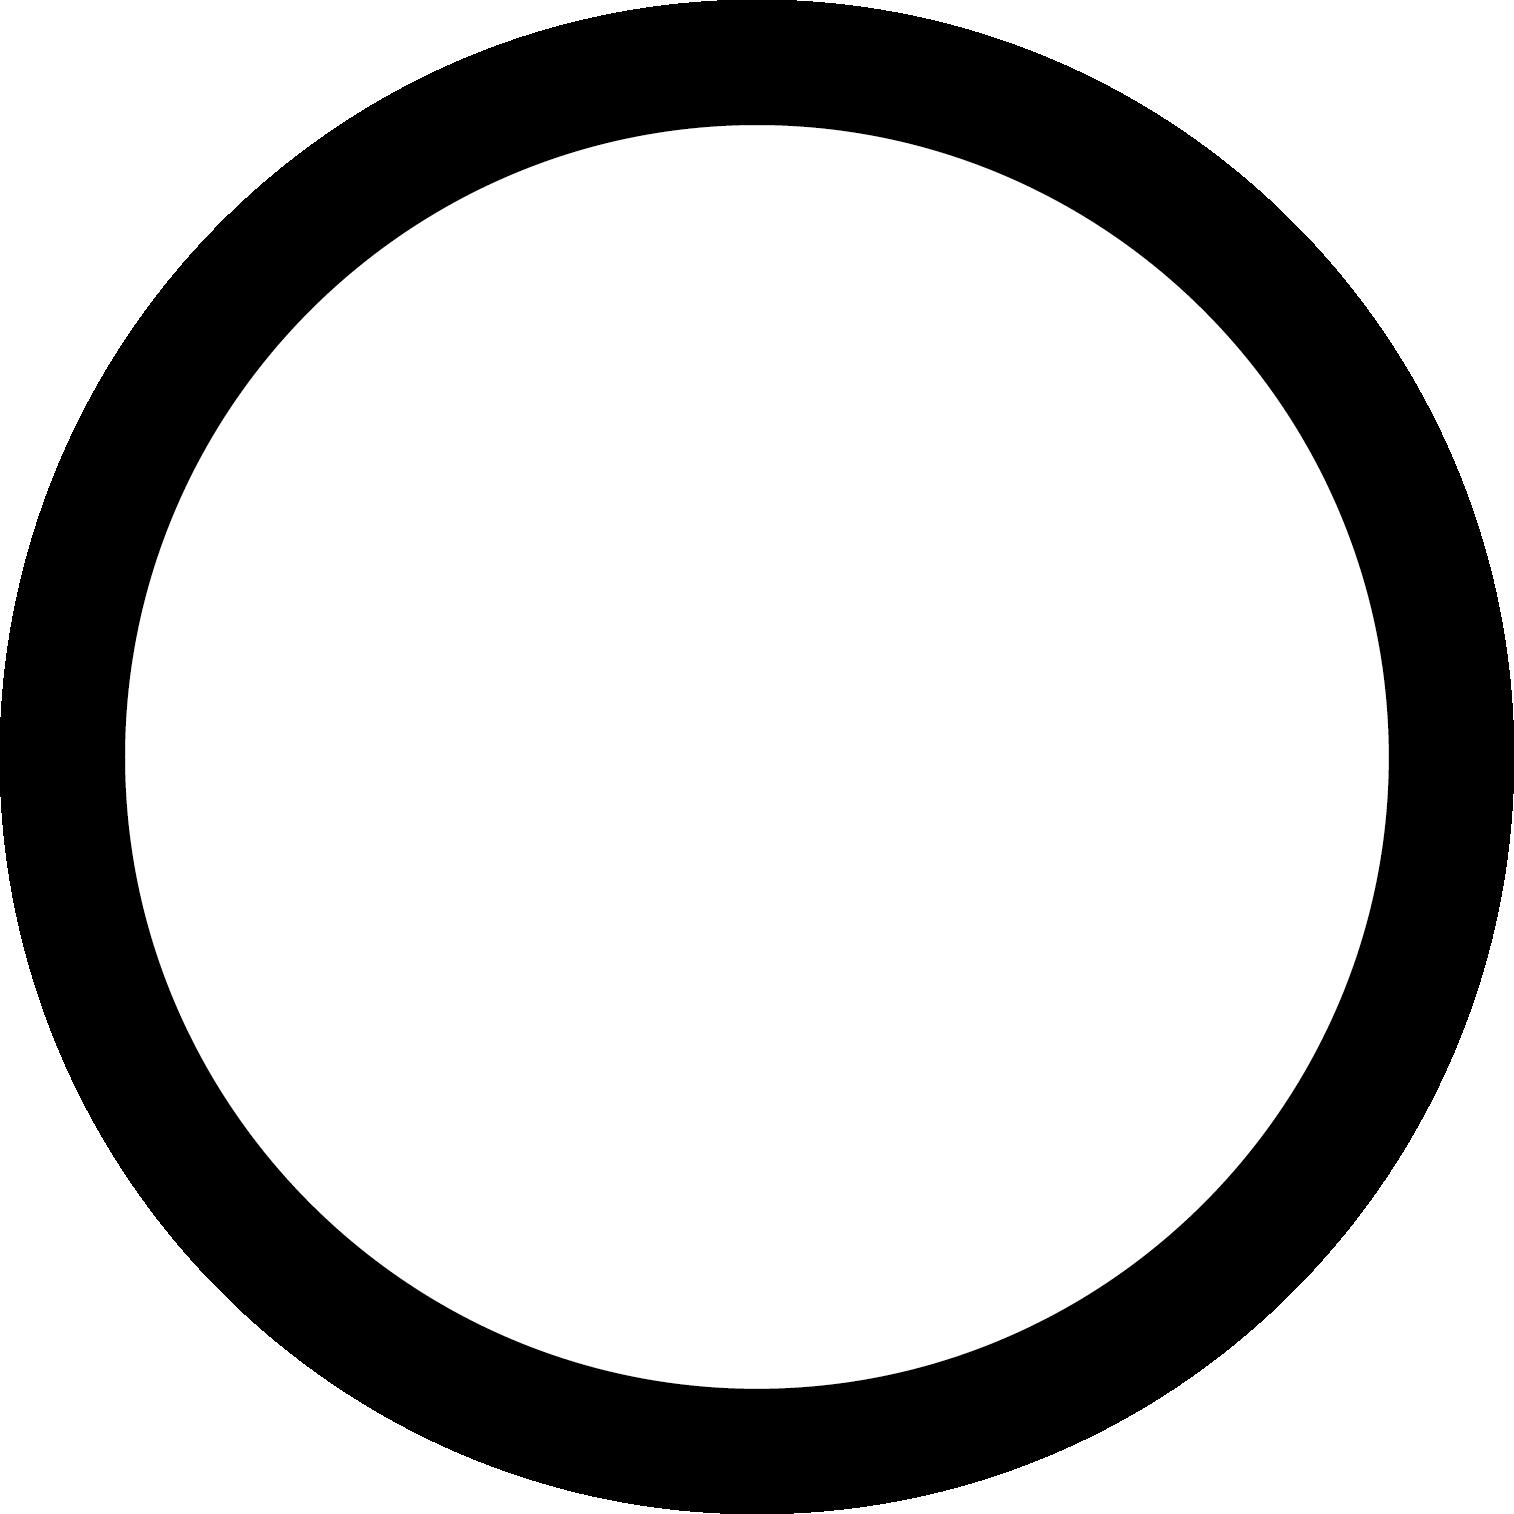 Black Circle Clip Art At Clker.